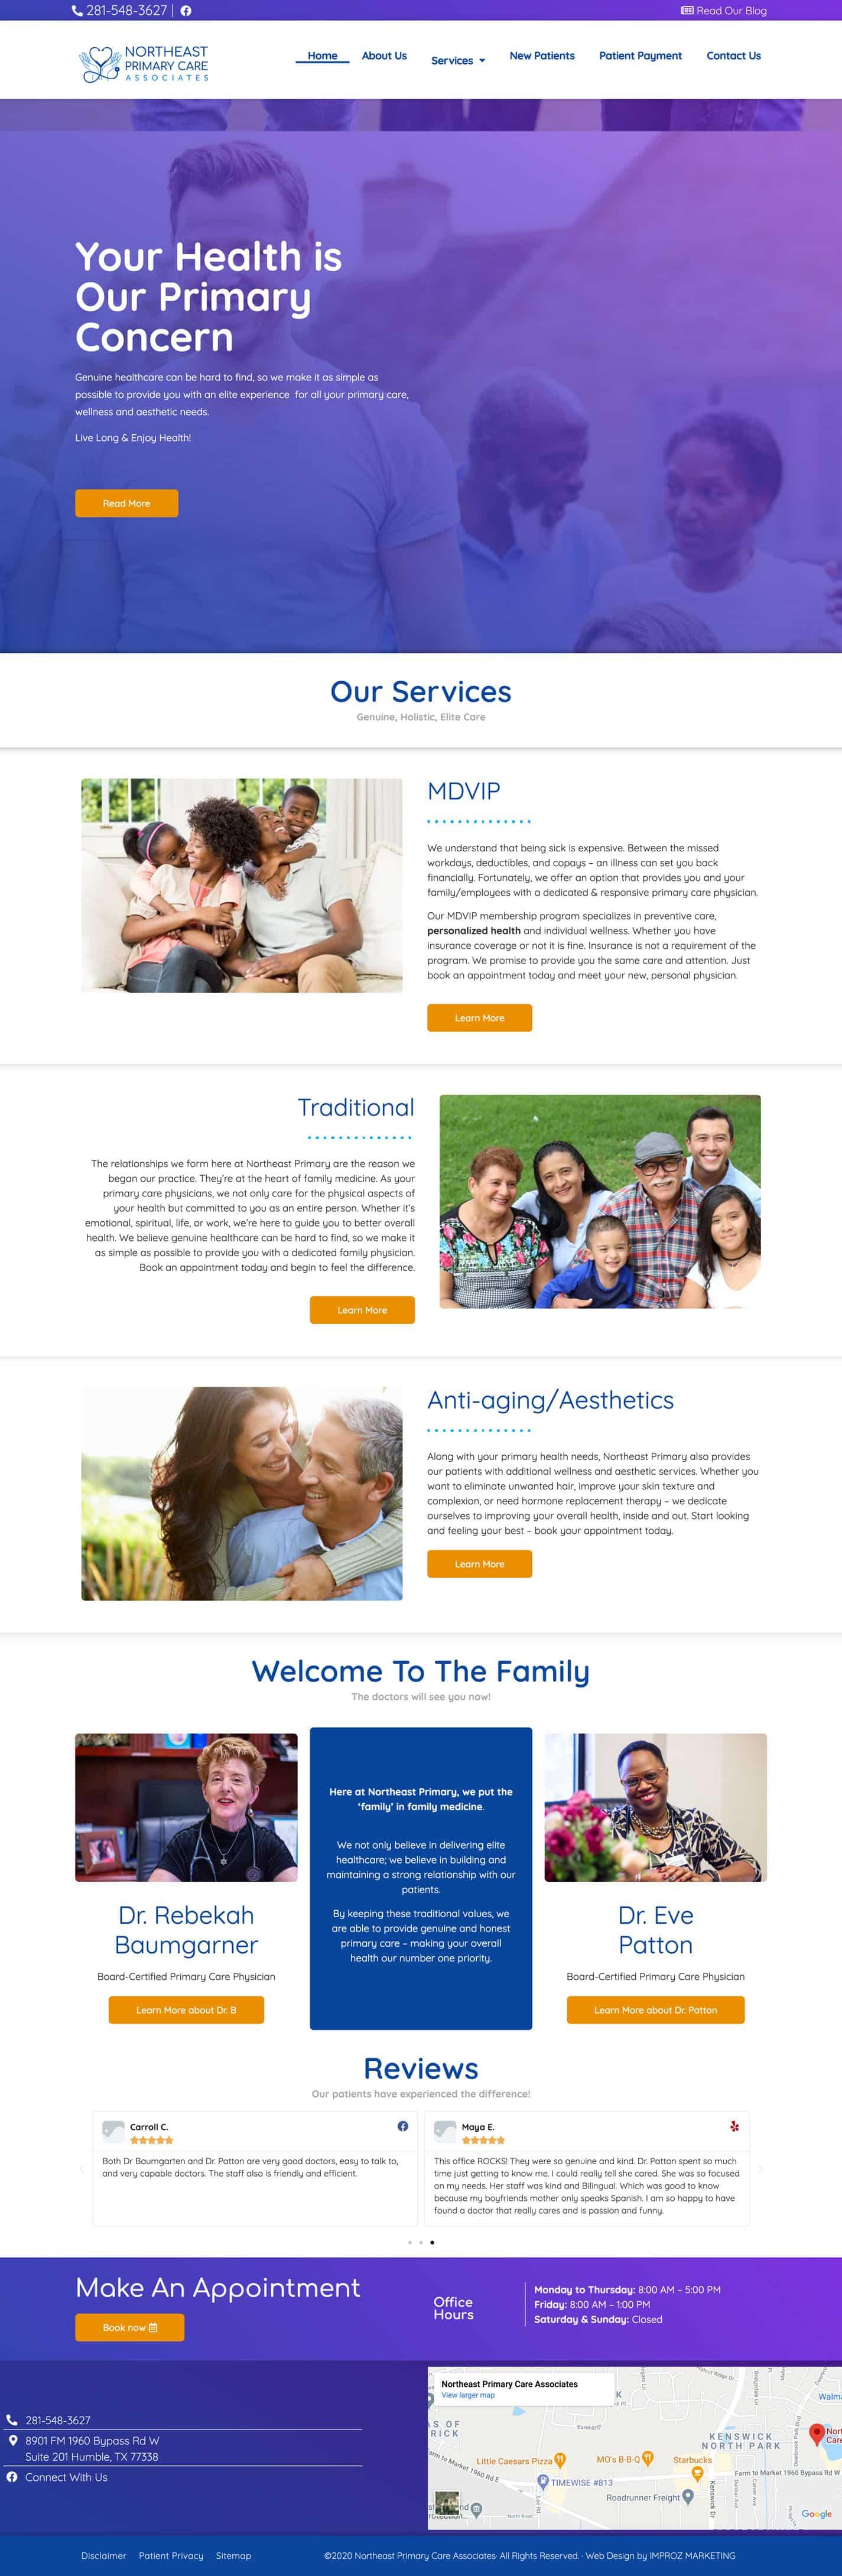 NE-primary-care-website-design-portfolio-IMPROZ-Marketing